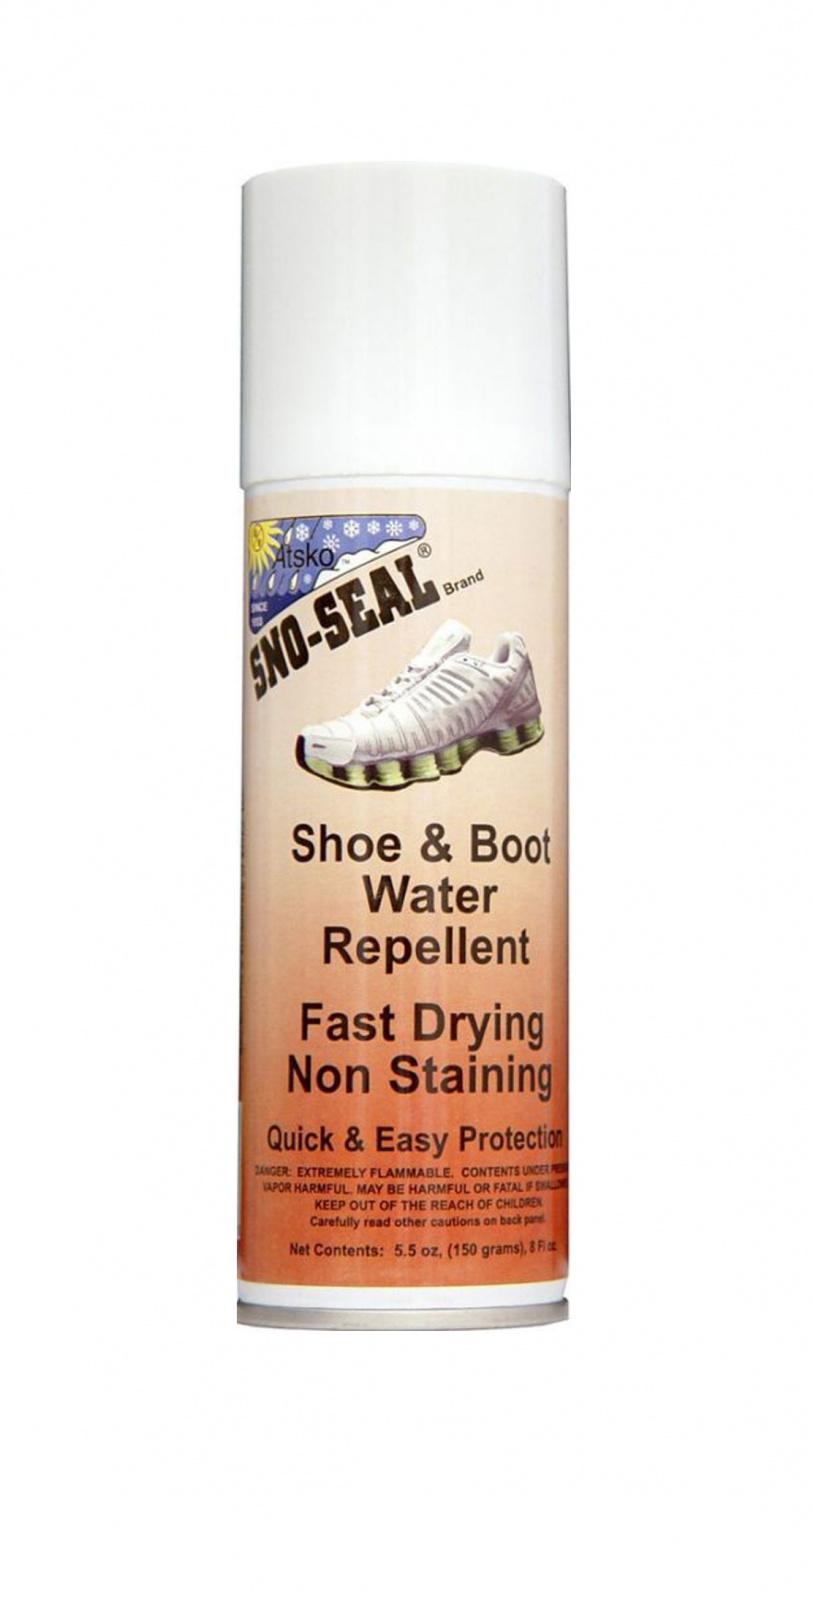 Atsko SNO-SEAL Water Repellent viz obrázek Impregnace